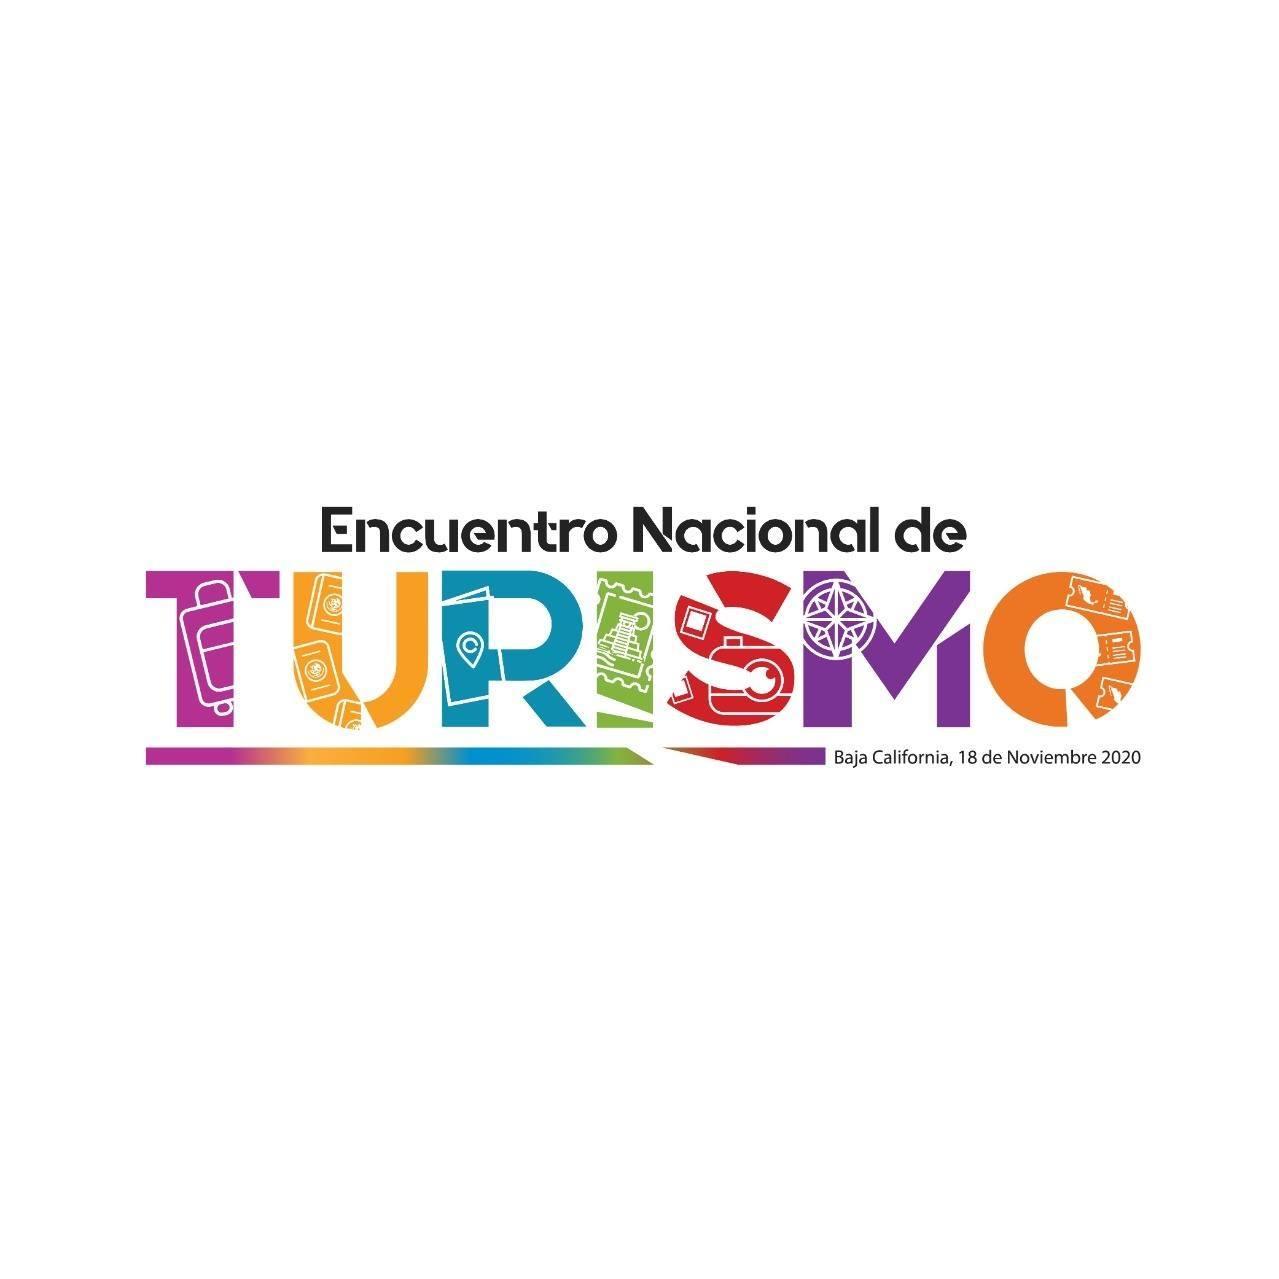 turismo, encuentro, nacional, tijuana, bc, covid, pandemia, méxico, ensenada, mexicali, armando